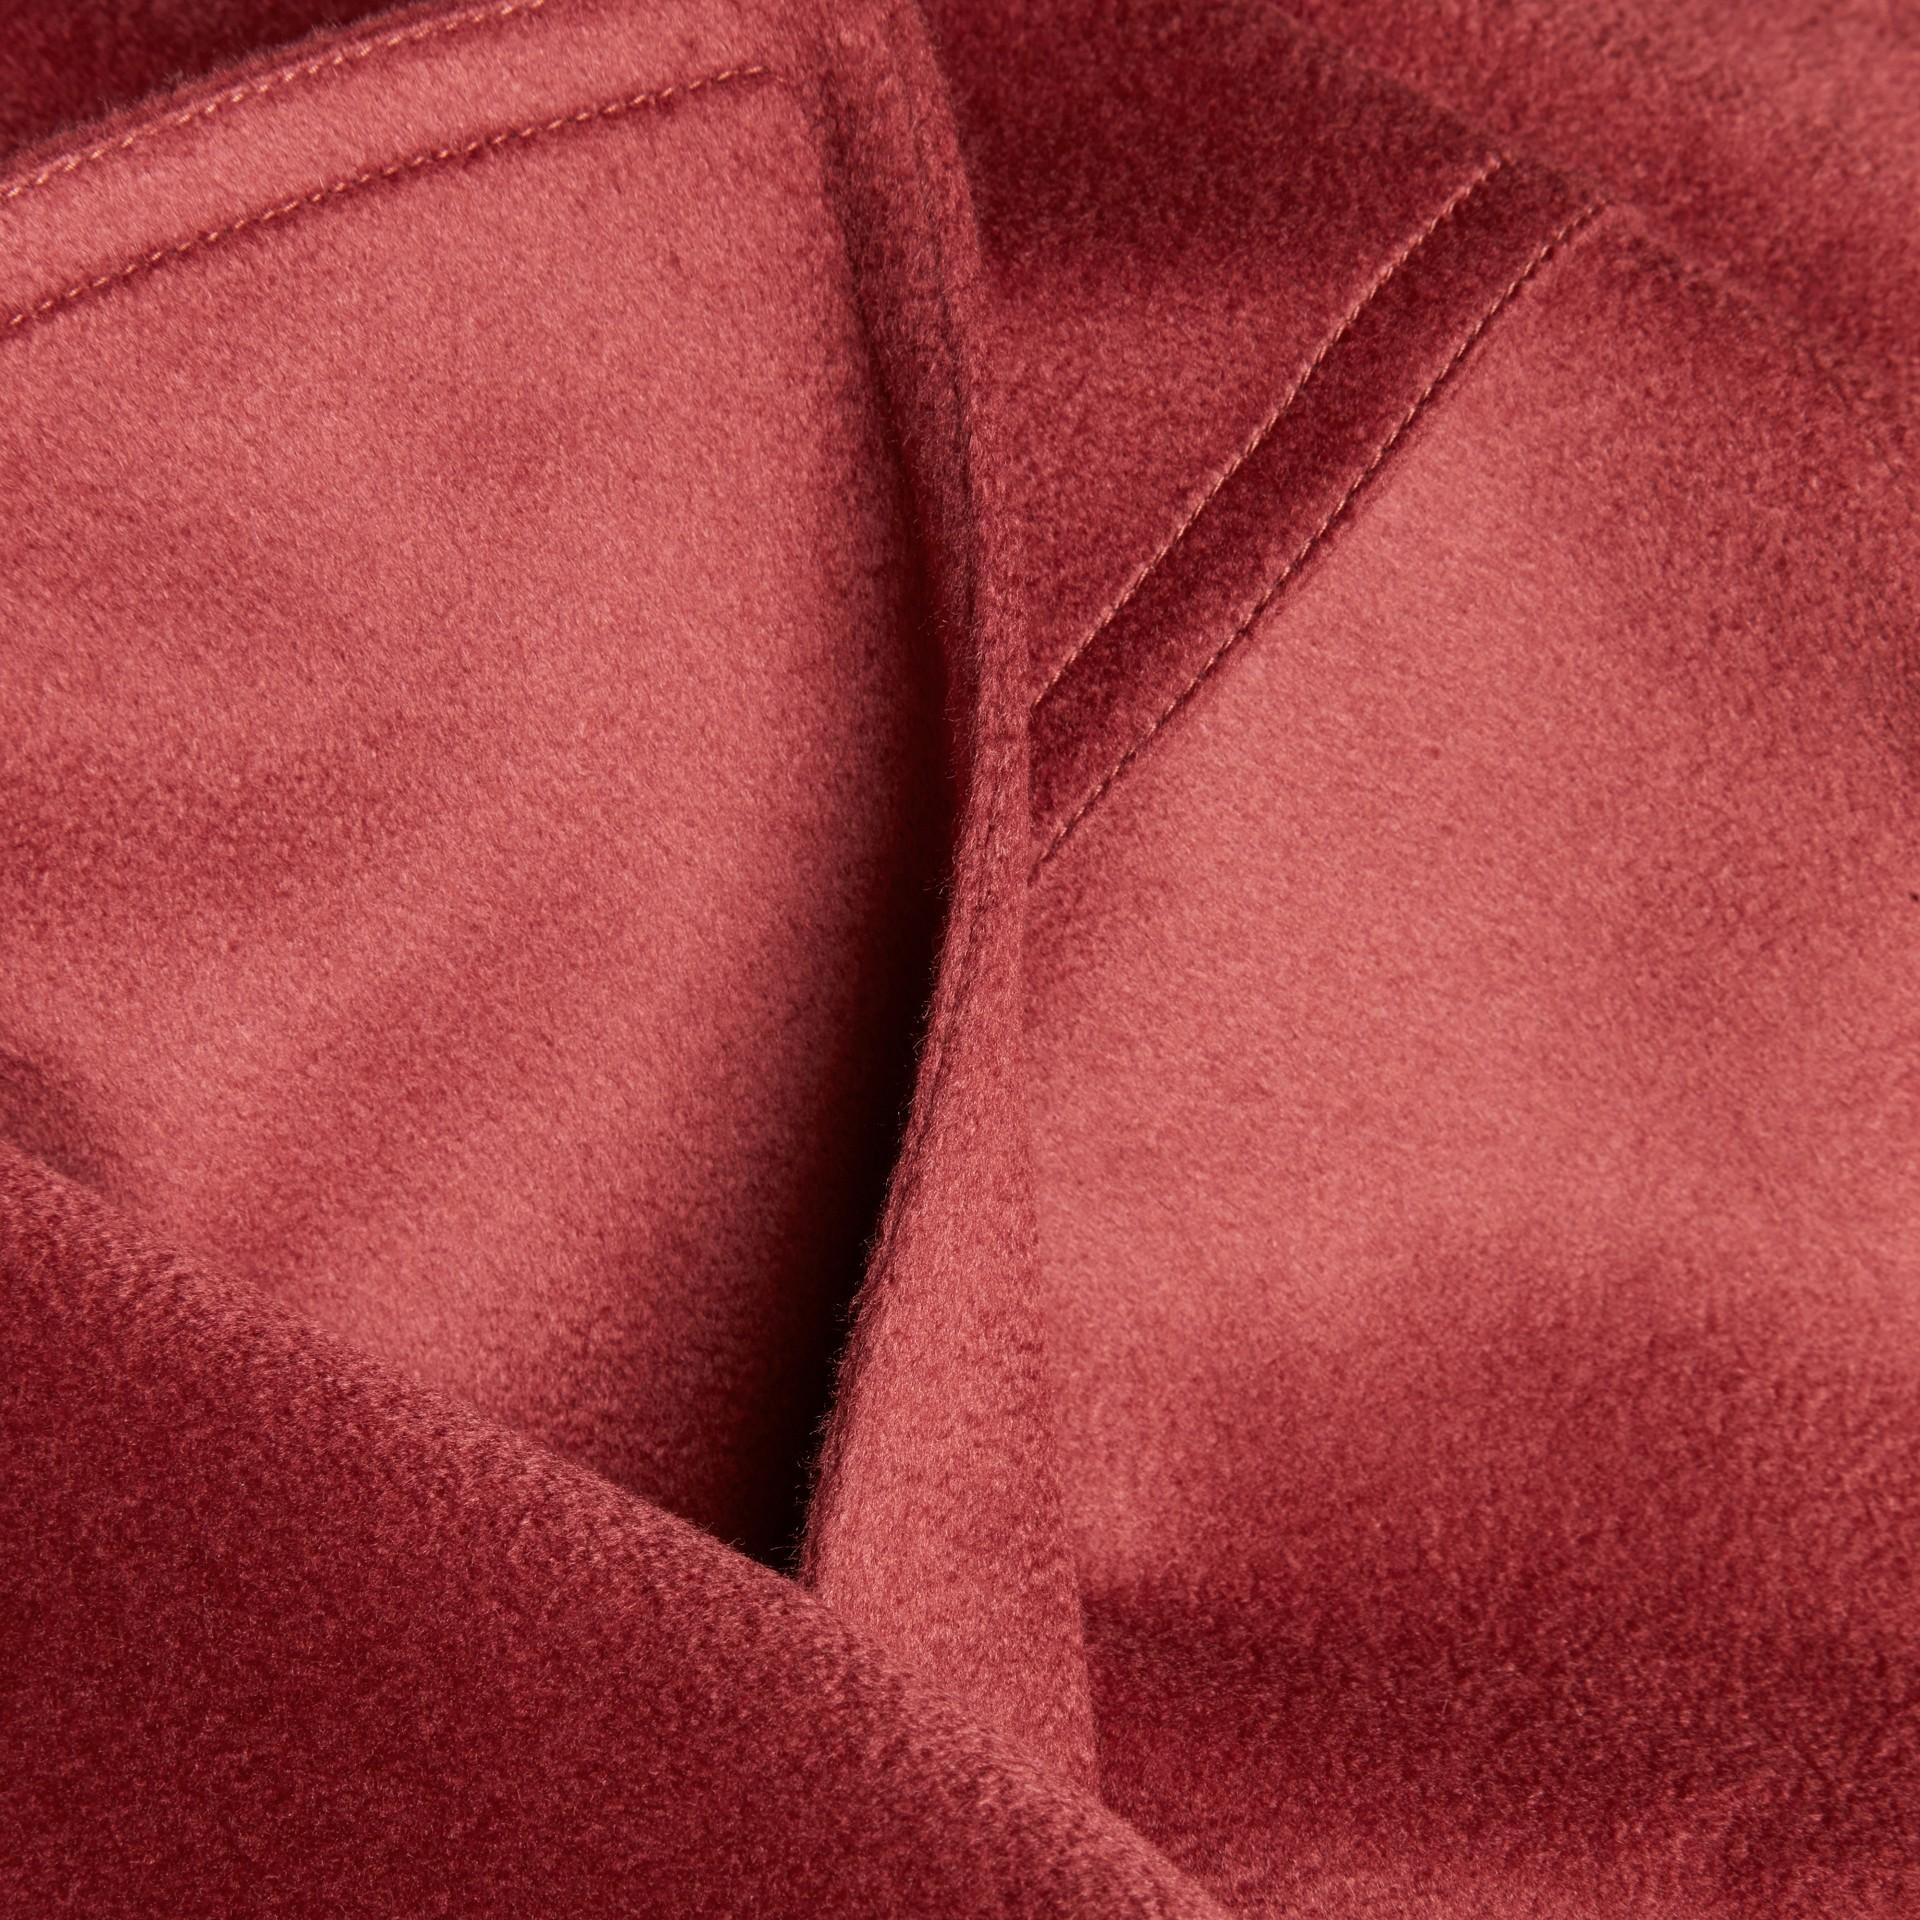 Rose pivoine cendrée Trench-coat portefeuille en cachemire Rose Pivoine Cendrée - photo de la galerie 2